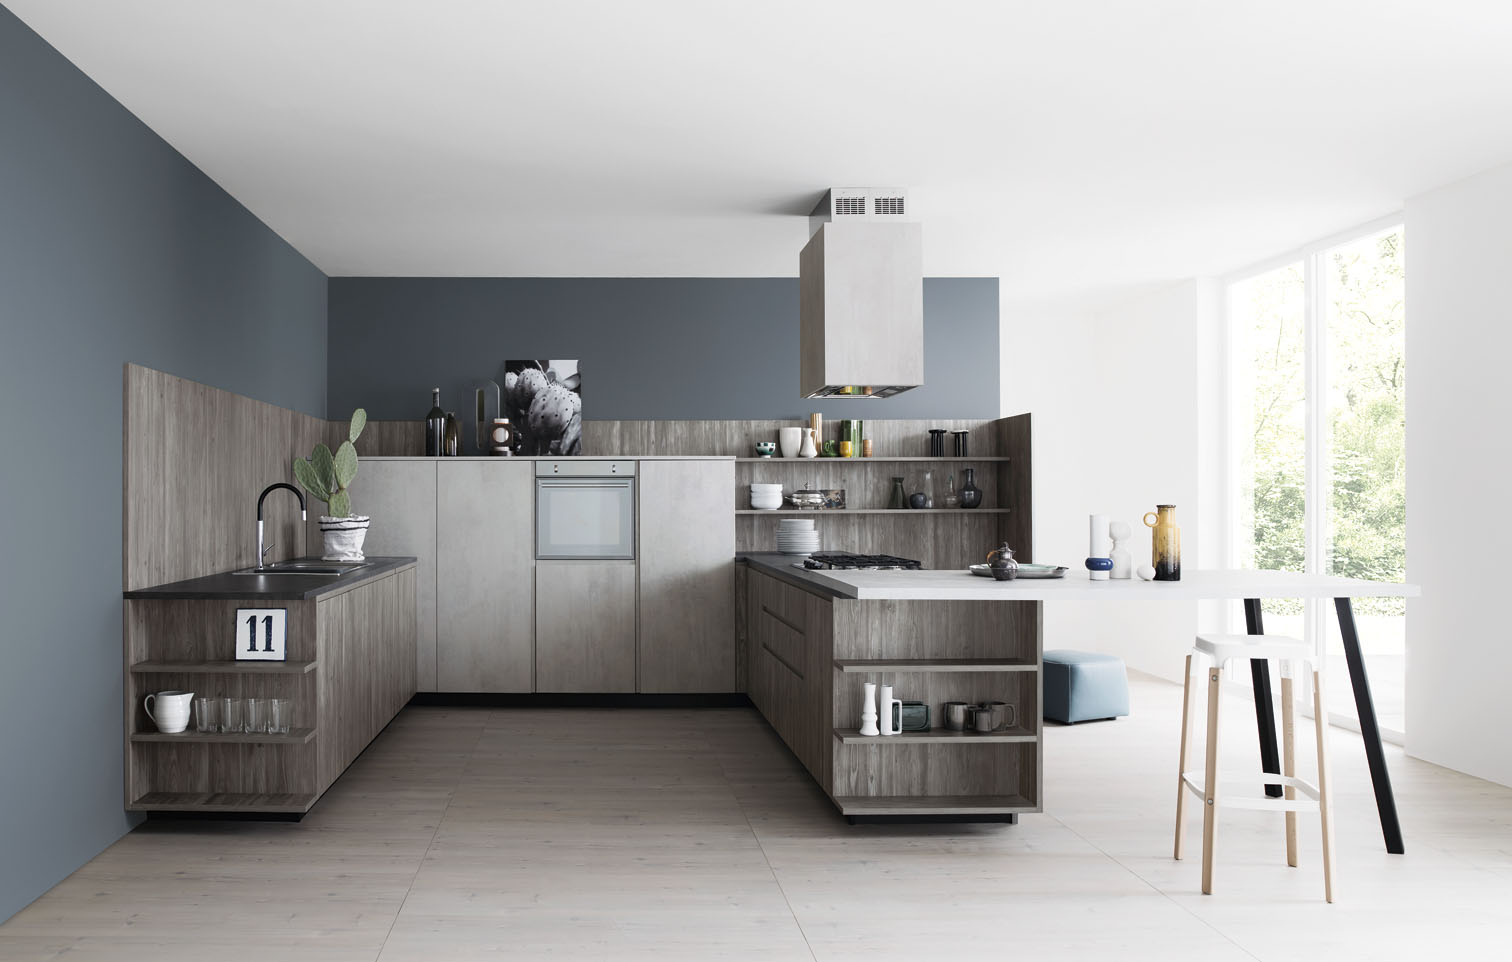 Lupparelli cesar cucine mobili lupparelli - Mobili urban chic ...